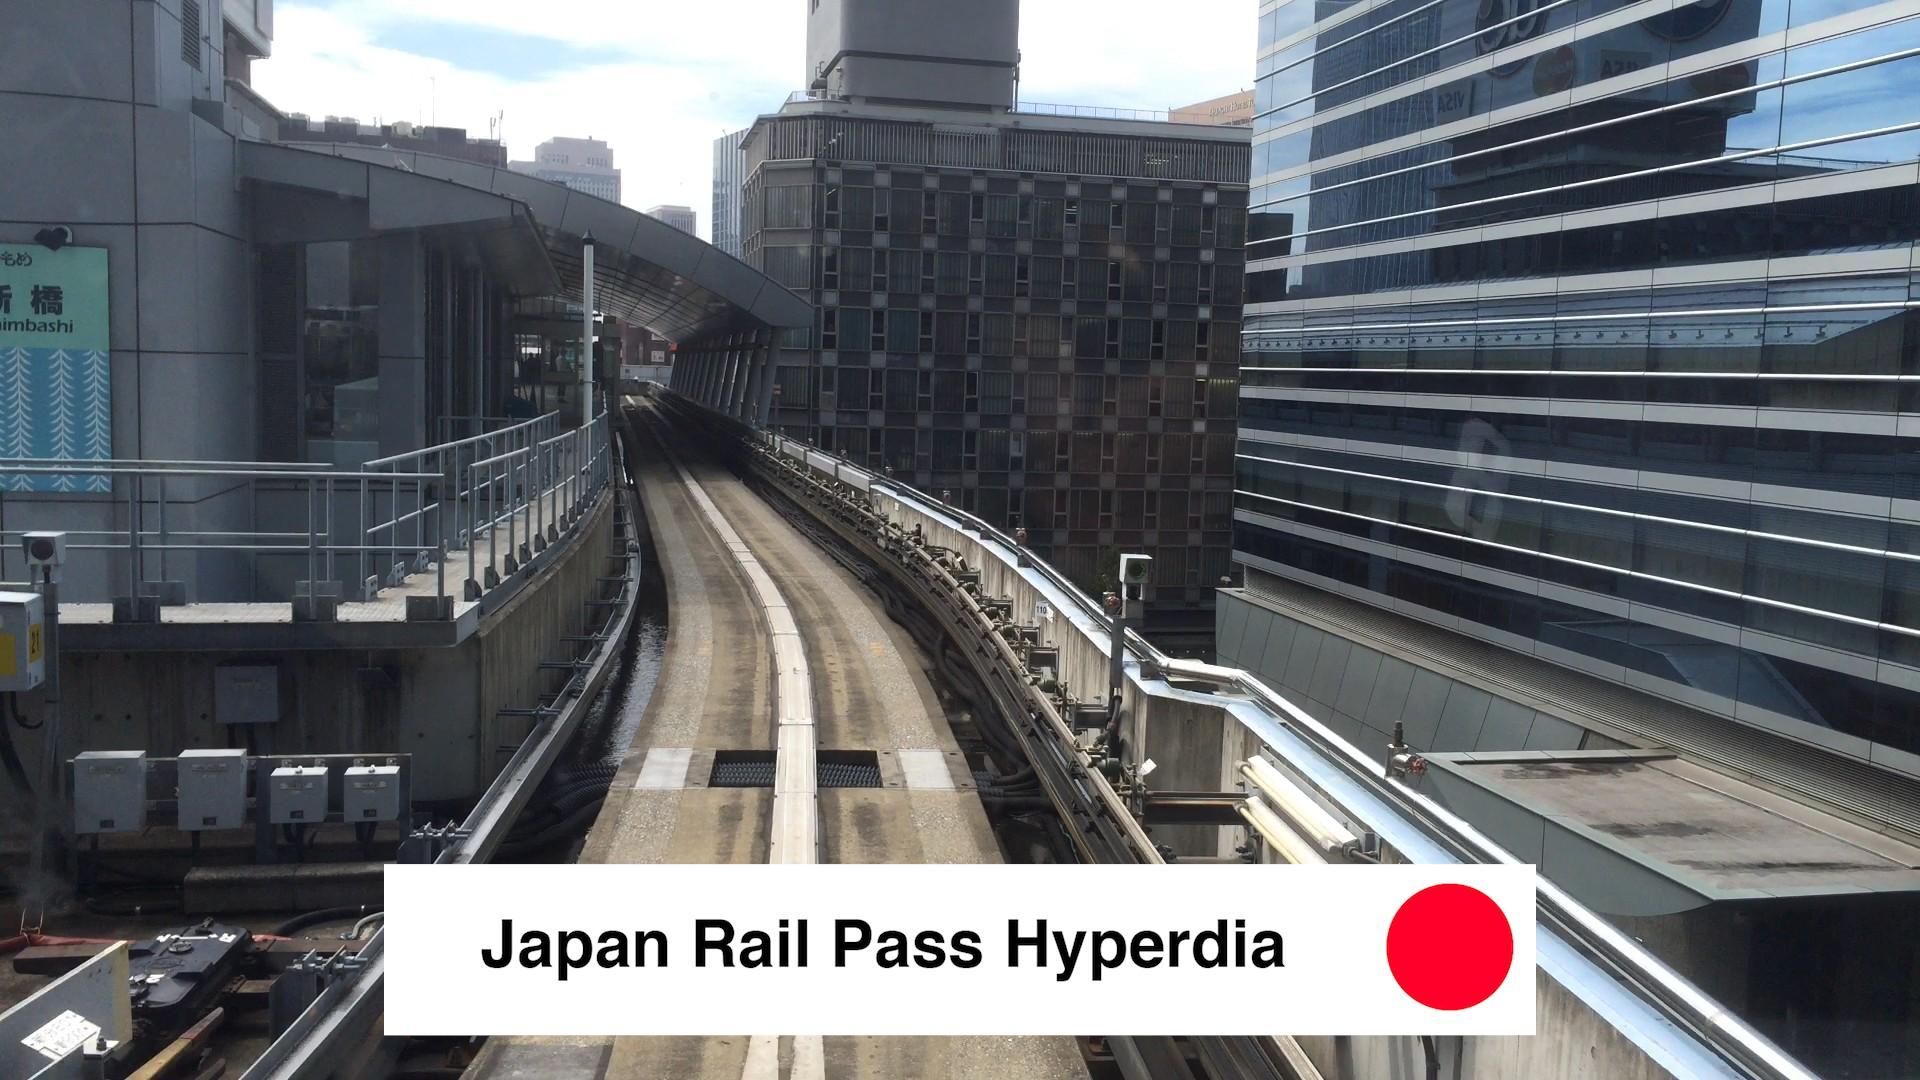 Japan Rail Hyperdia - Where To Buy Japan Rail Pass How To Use JR Pass In Tokyo. JR Pass Price